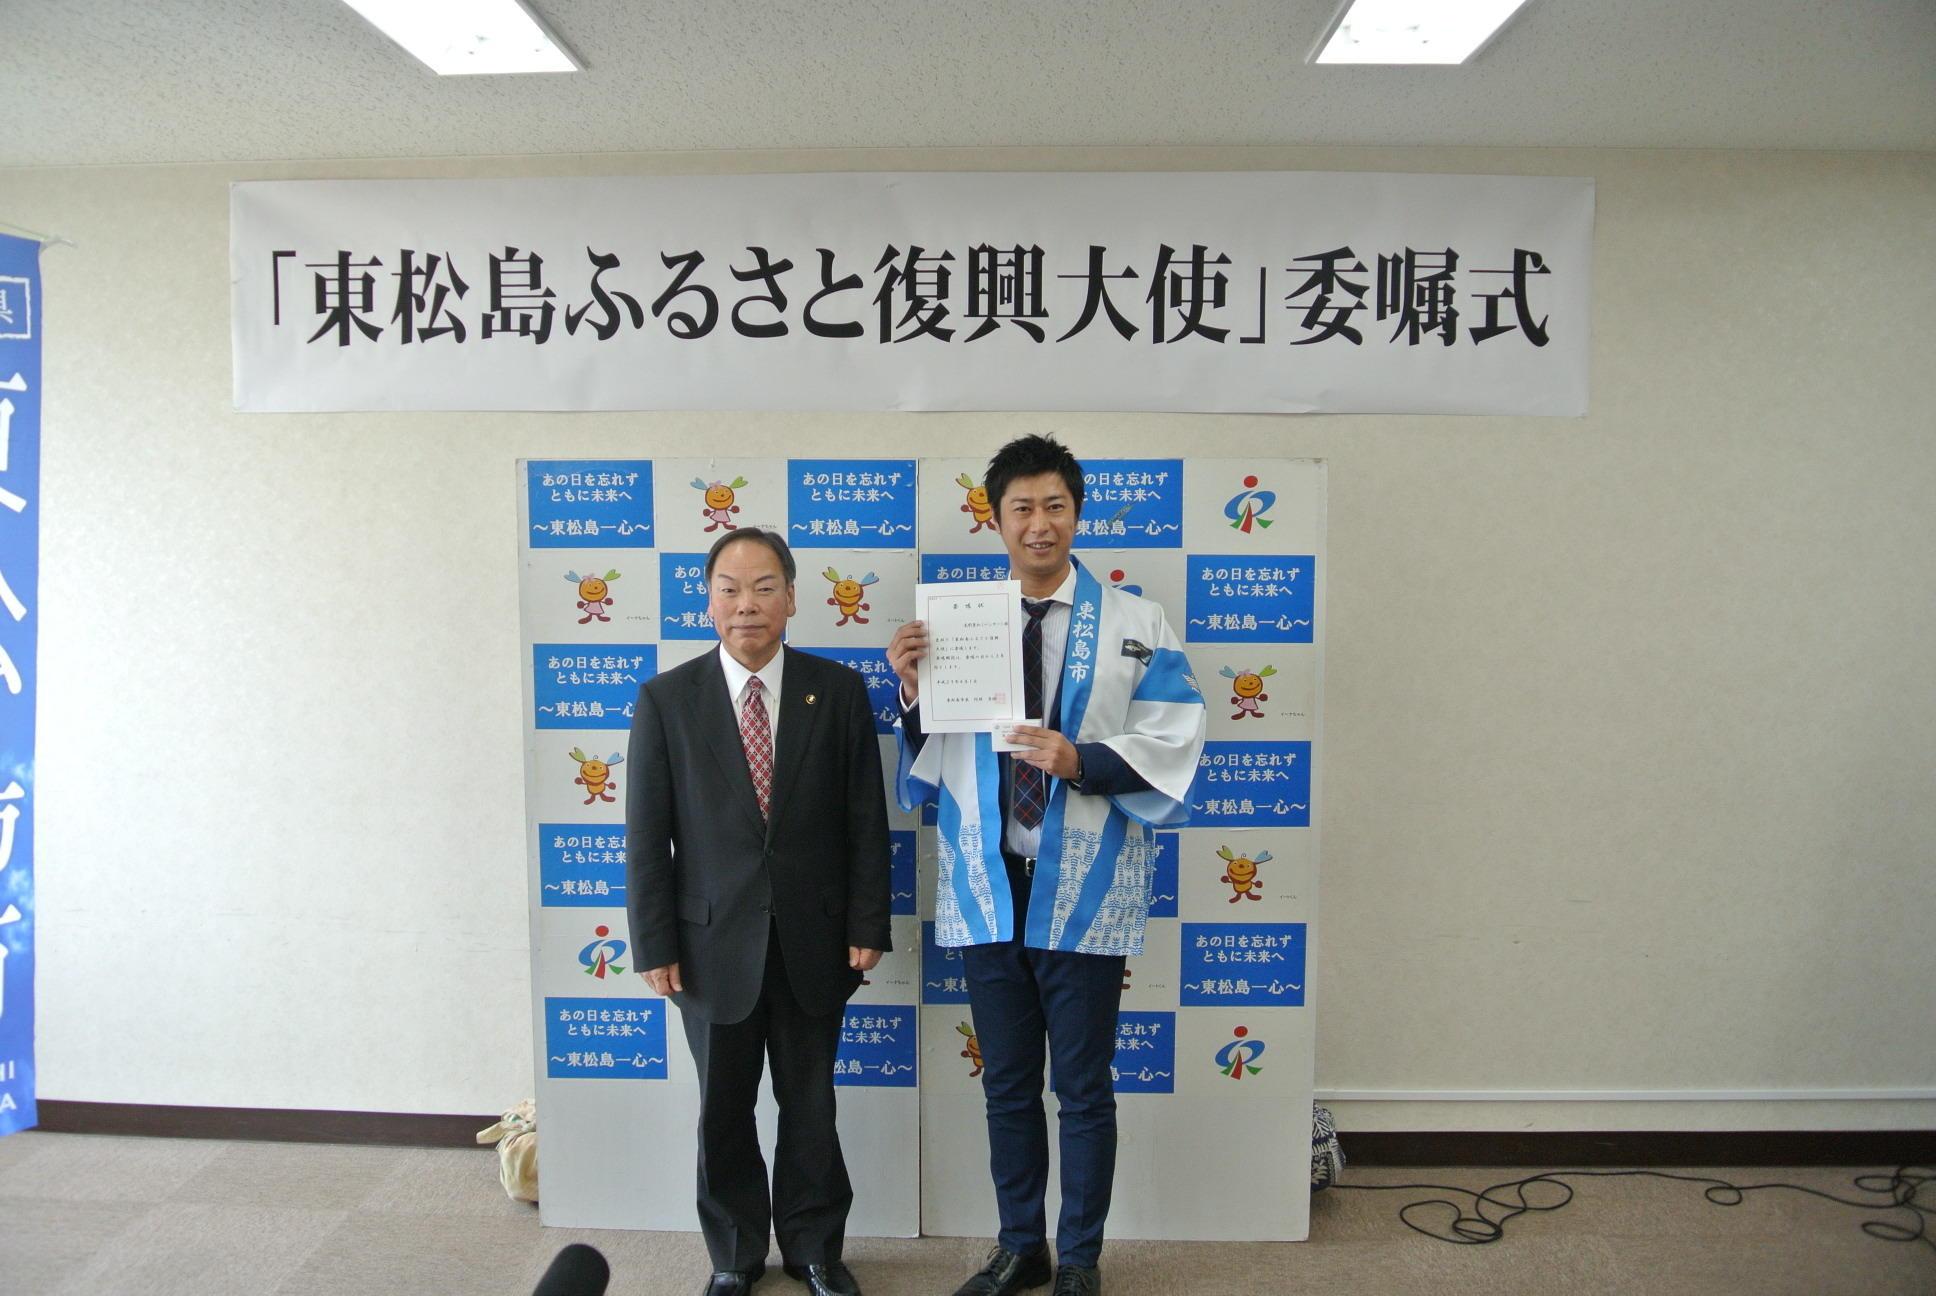 http://news.yoshimoto.co.jp/20170410145441-6b666008a9ea0fb720f12d5fb4f7eb5ada74e56f.jpg